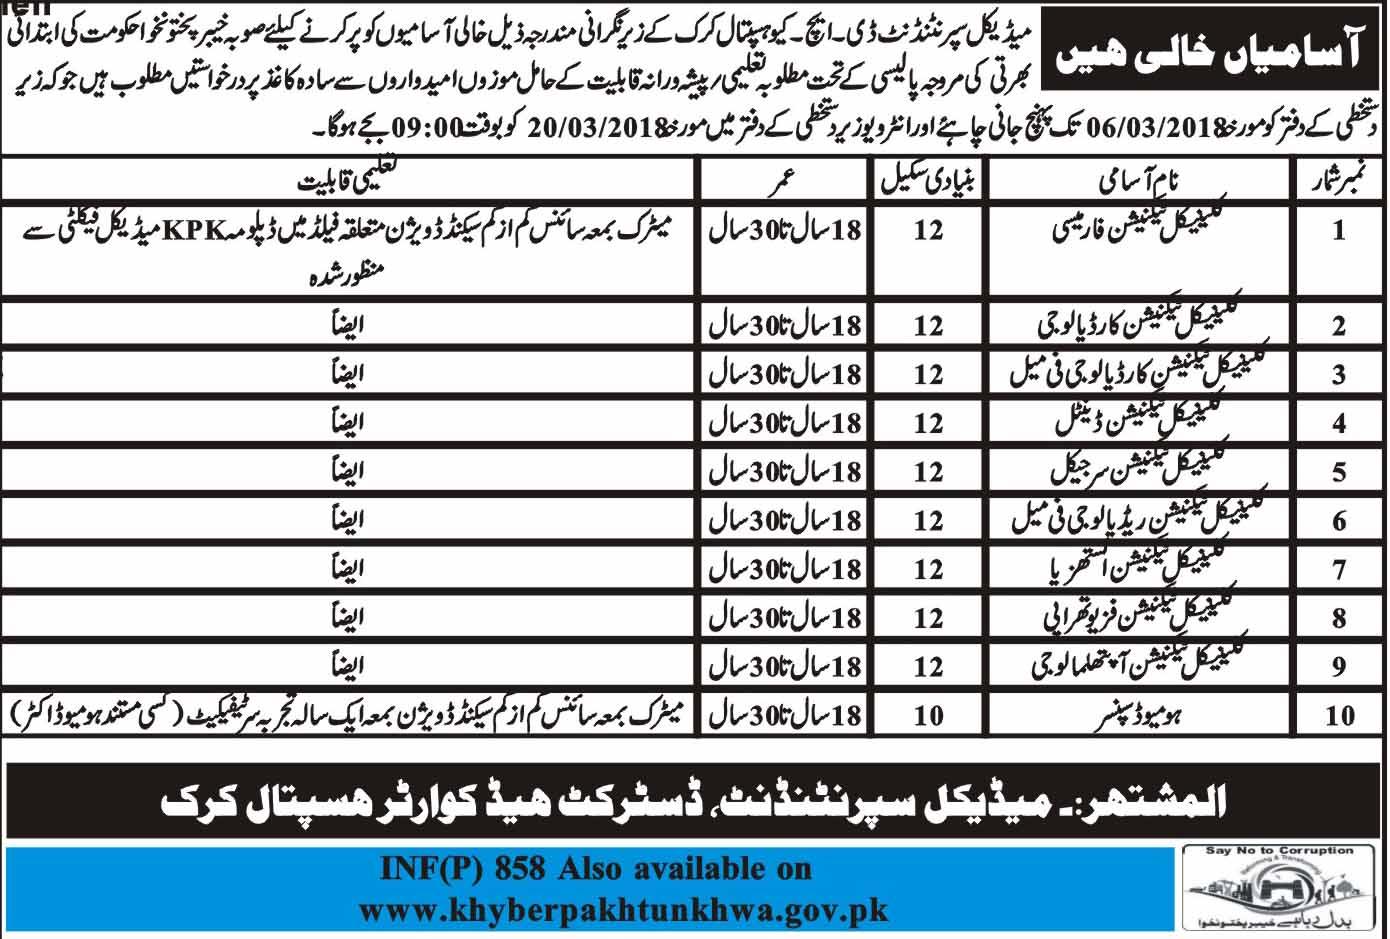 District Headquarter Hospital Karak KPK New Jobs 20th February 2018 Daily Mashriq Newspaper